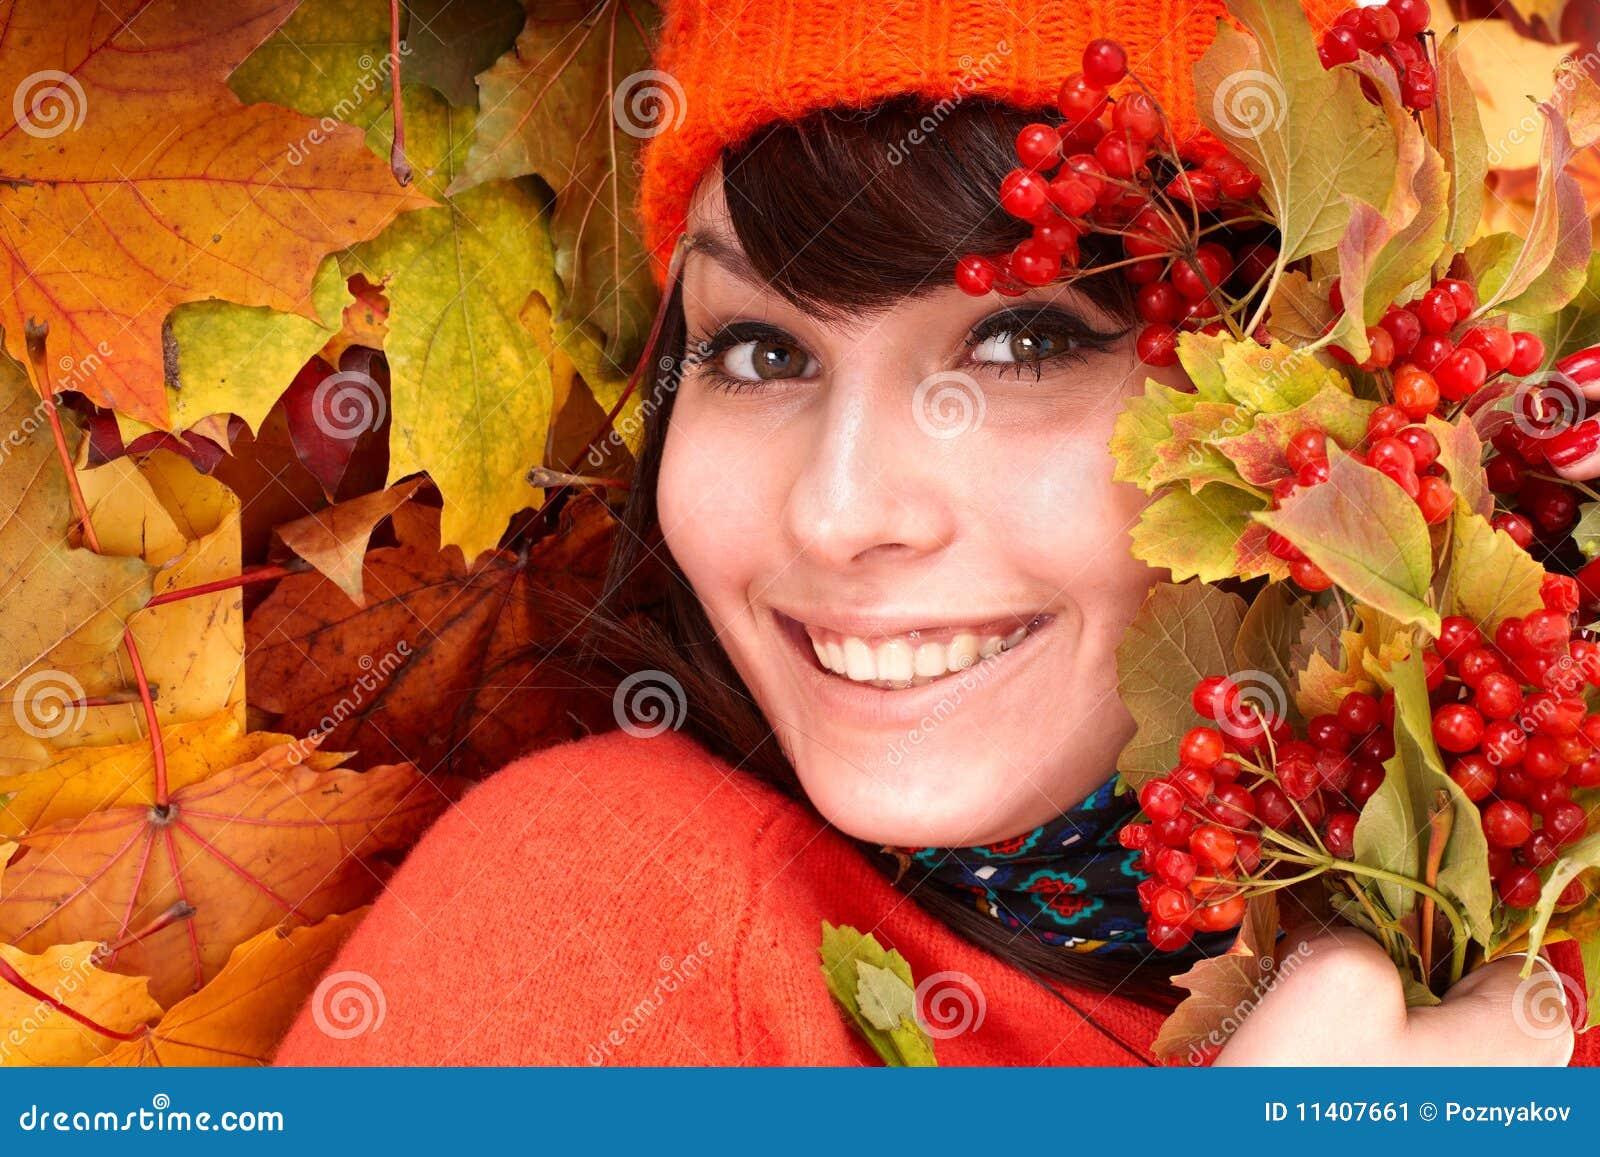 Girl in autumn orange hat on leaf group.